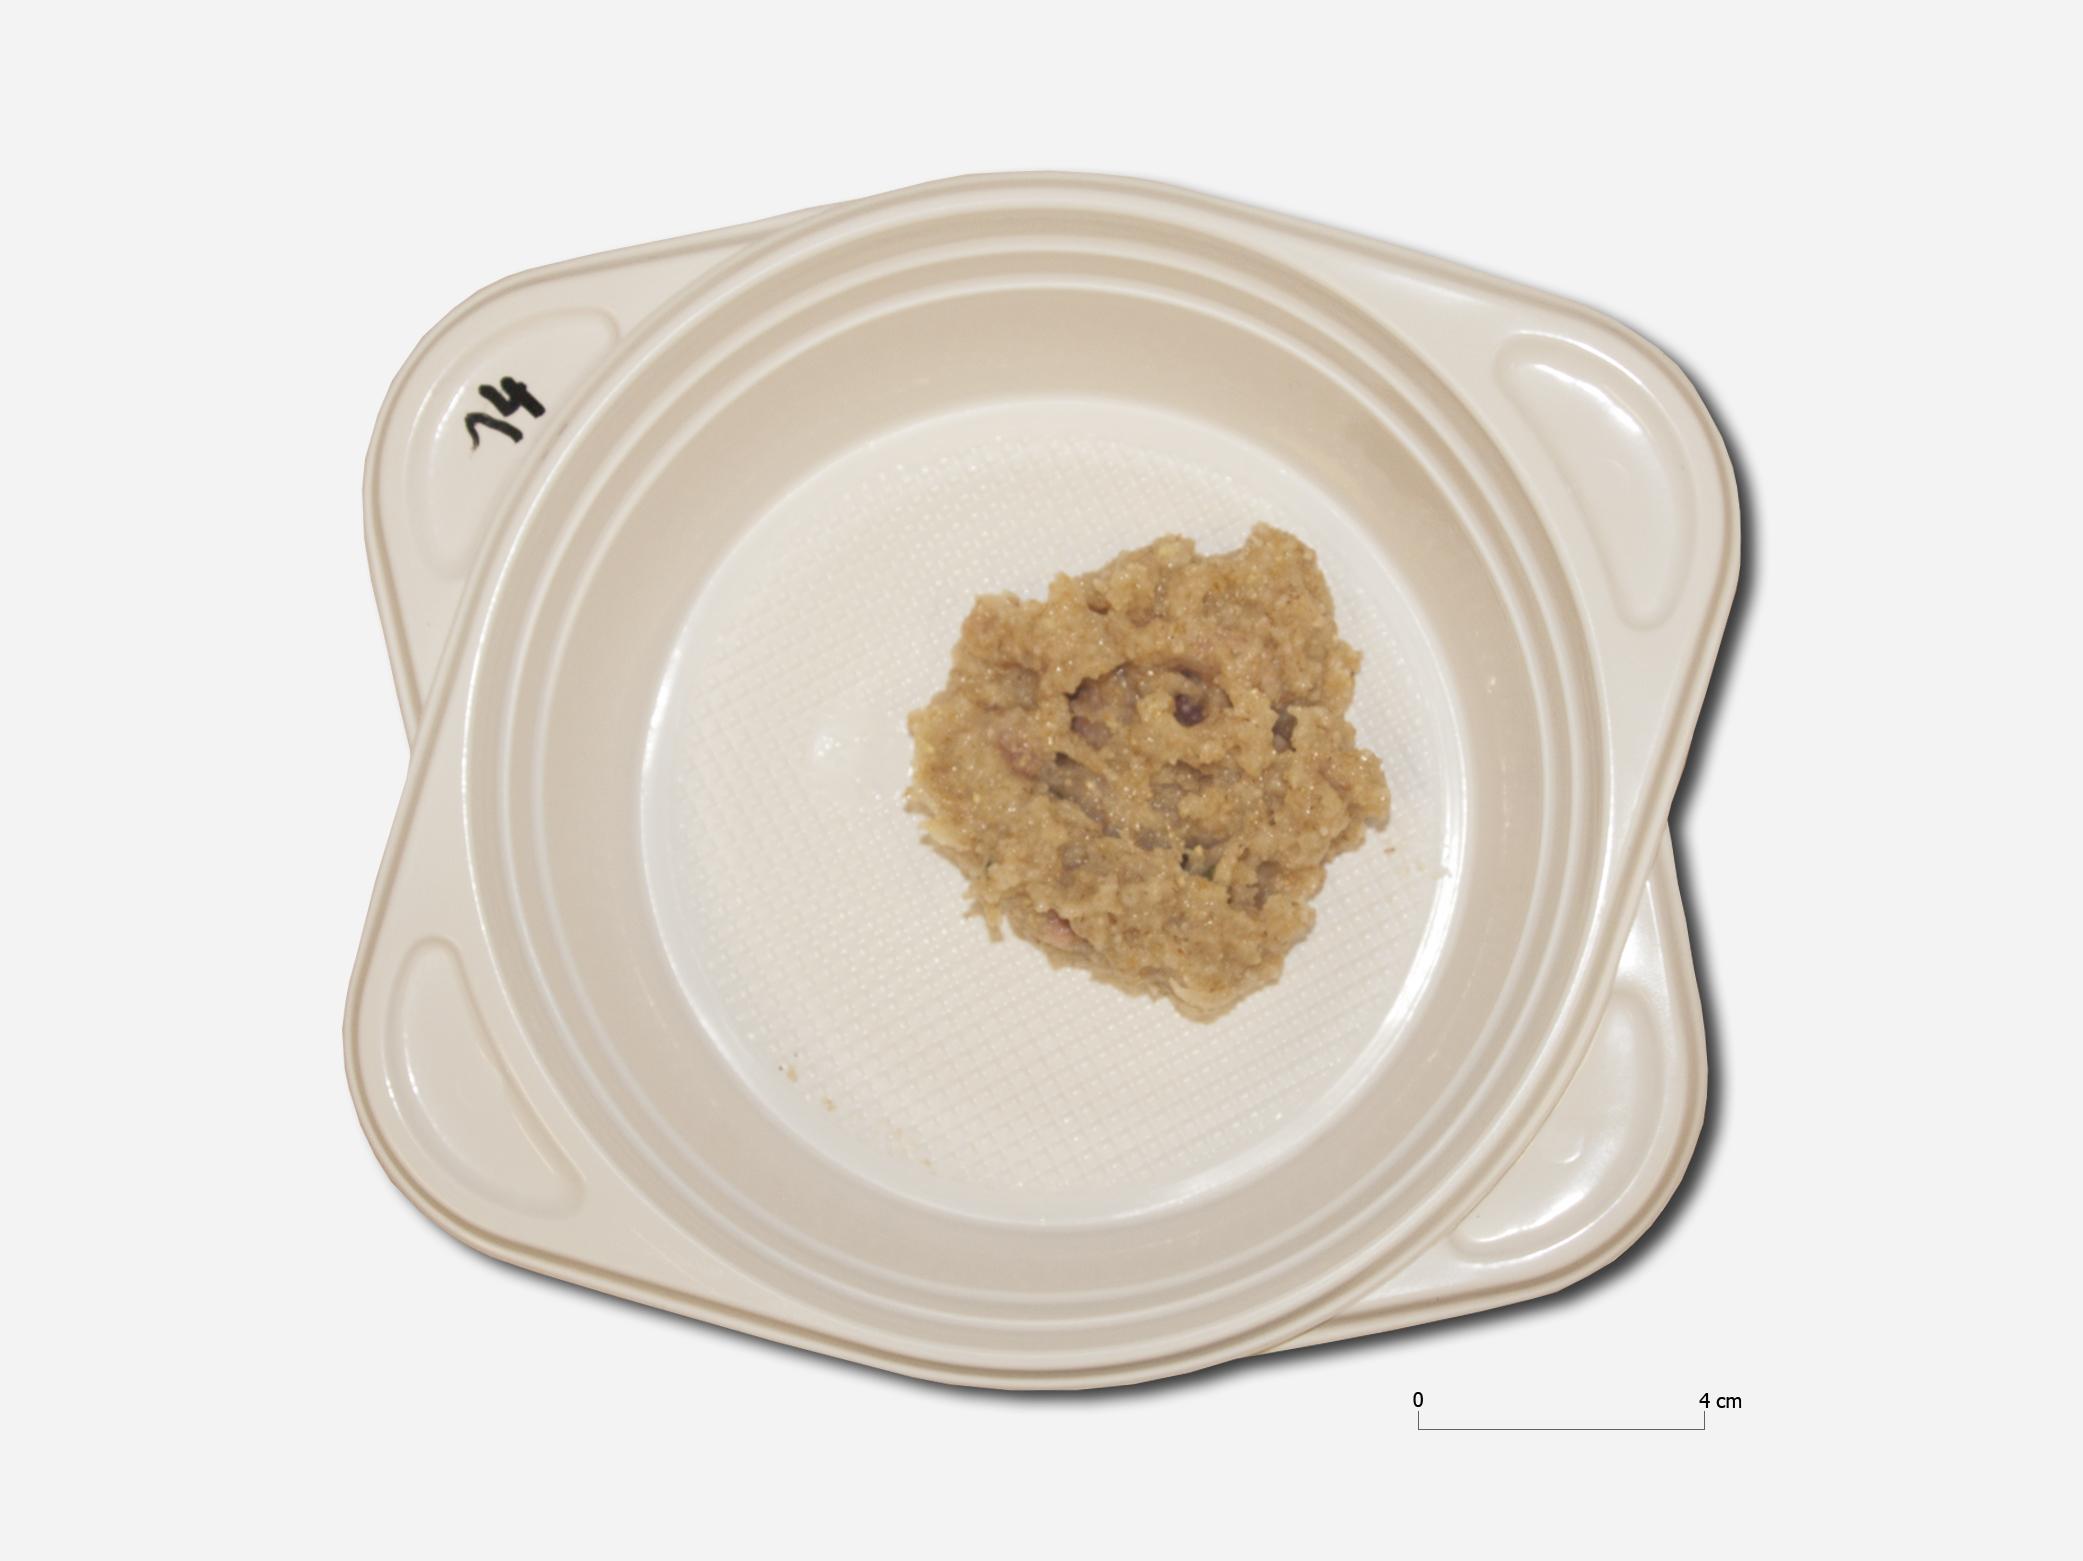 Abb. 1 Fertiggestellte puls (Probe VR2/LNF2012/14, 133 g; D. Hagmann 2014)